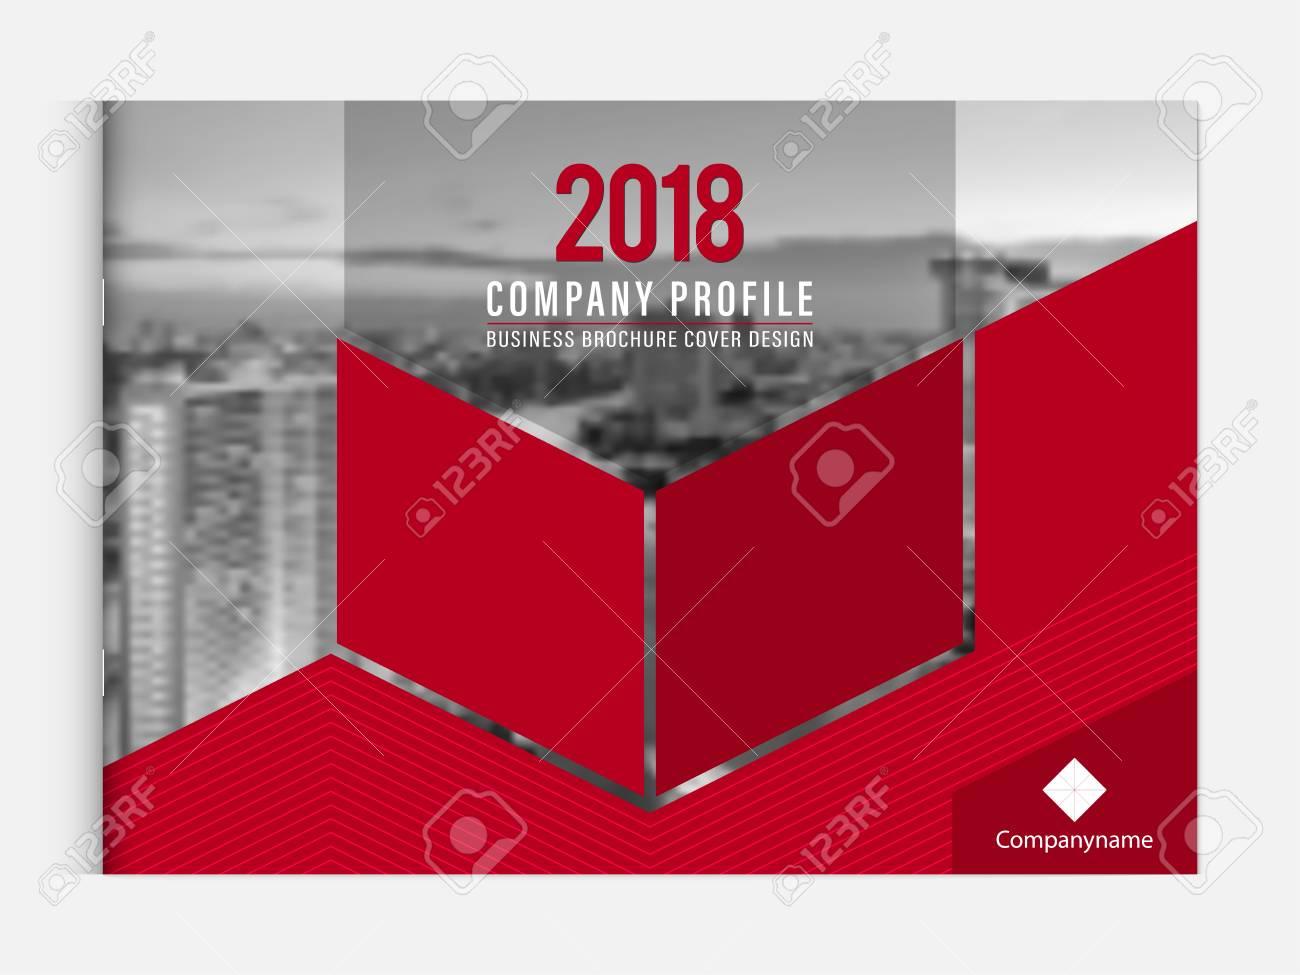 business brochure cover design template corporate company profile